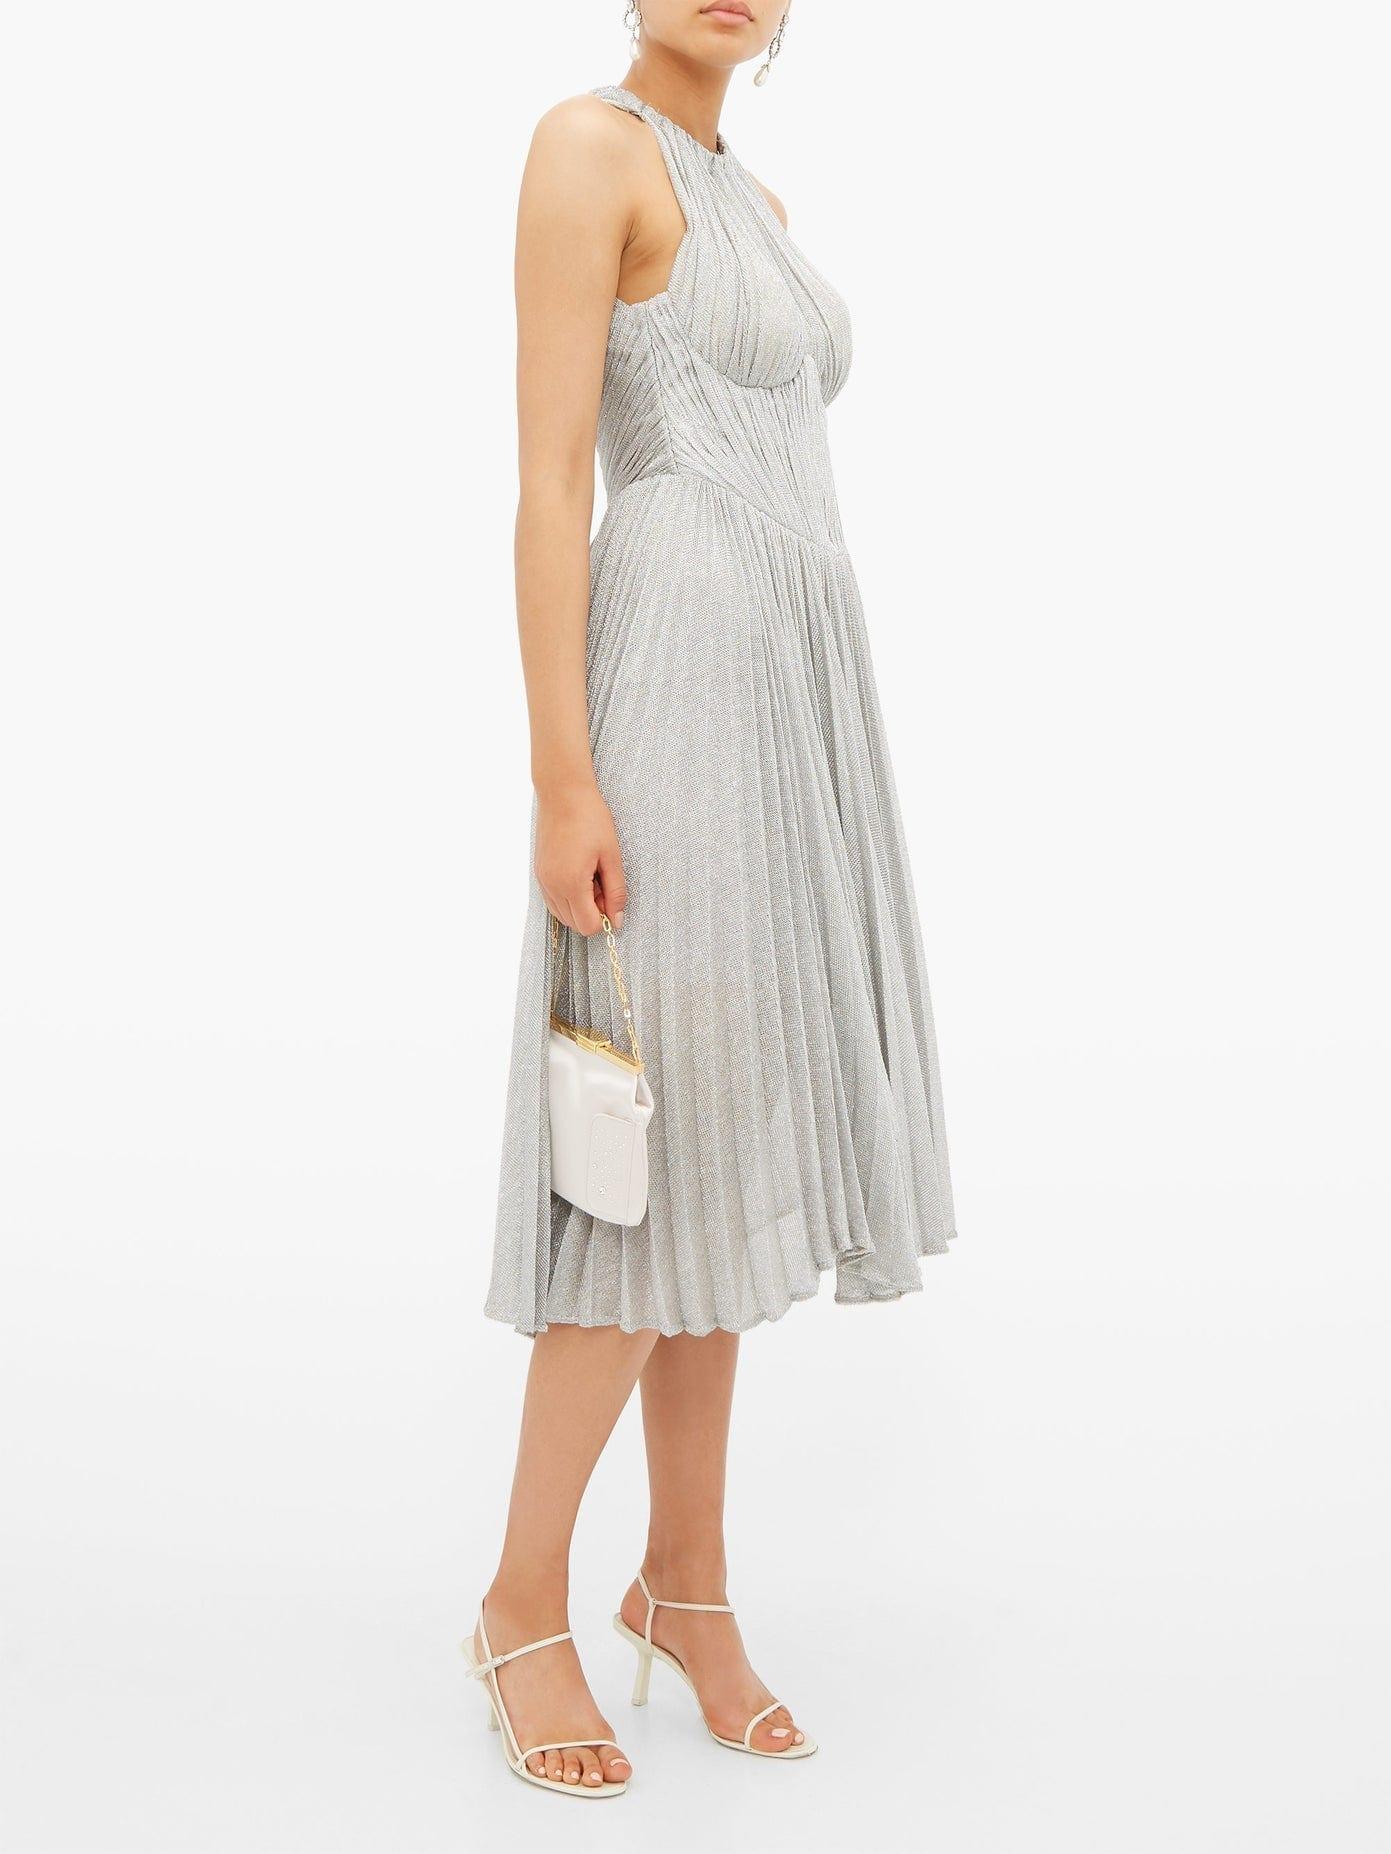 MARIA LUCIA HOHAN Bria Halterneck Metallic Dress